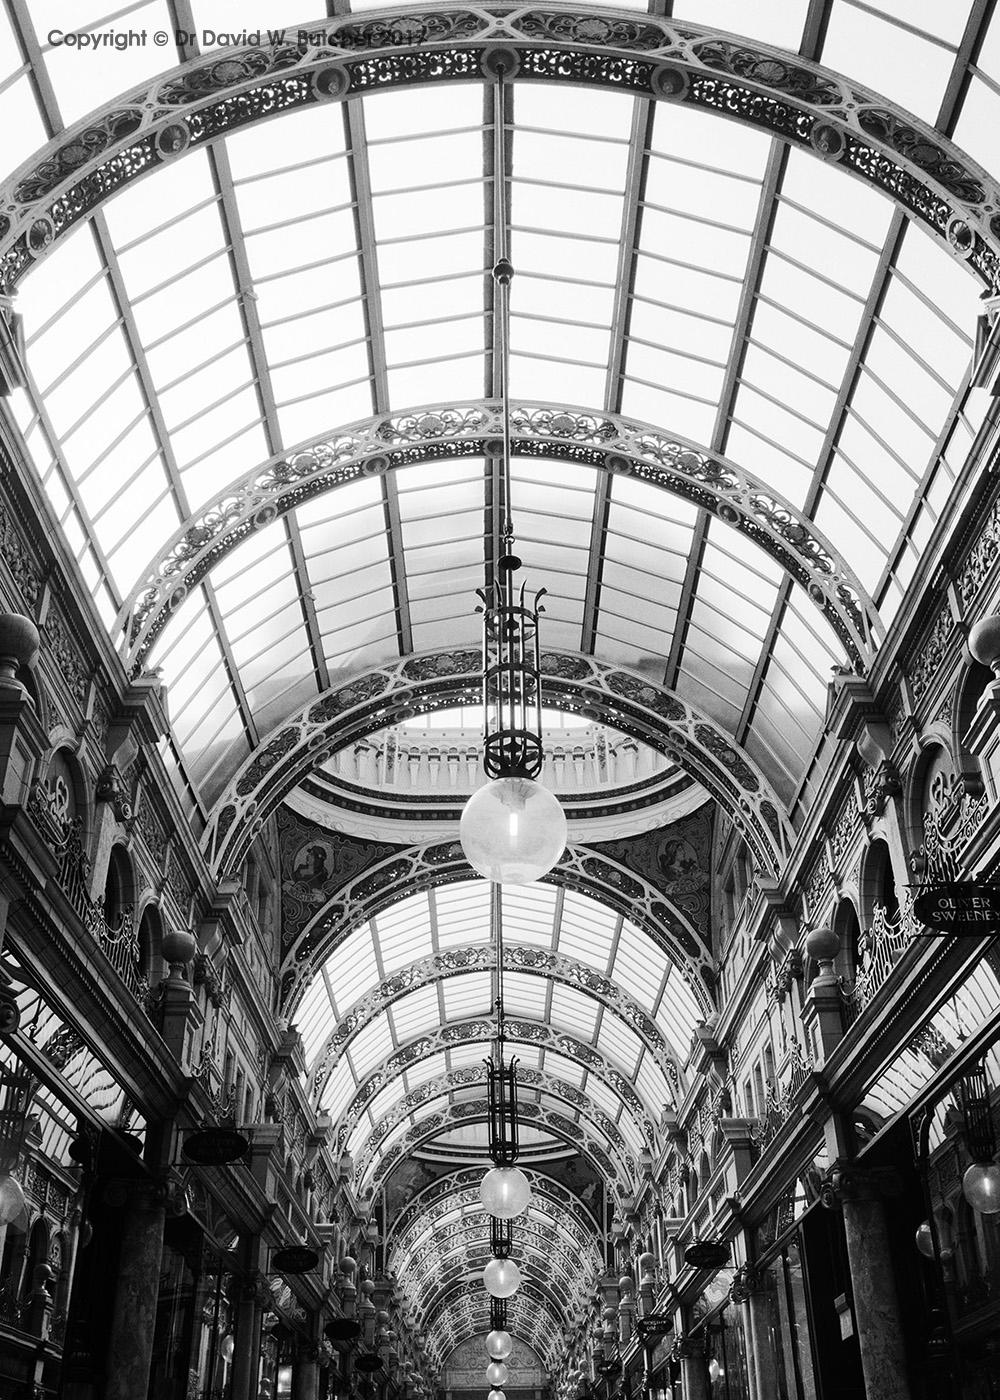 County Arcade Roof, Leeds, England